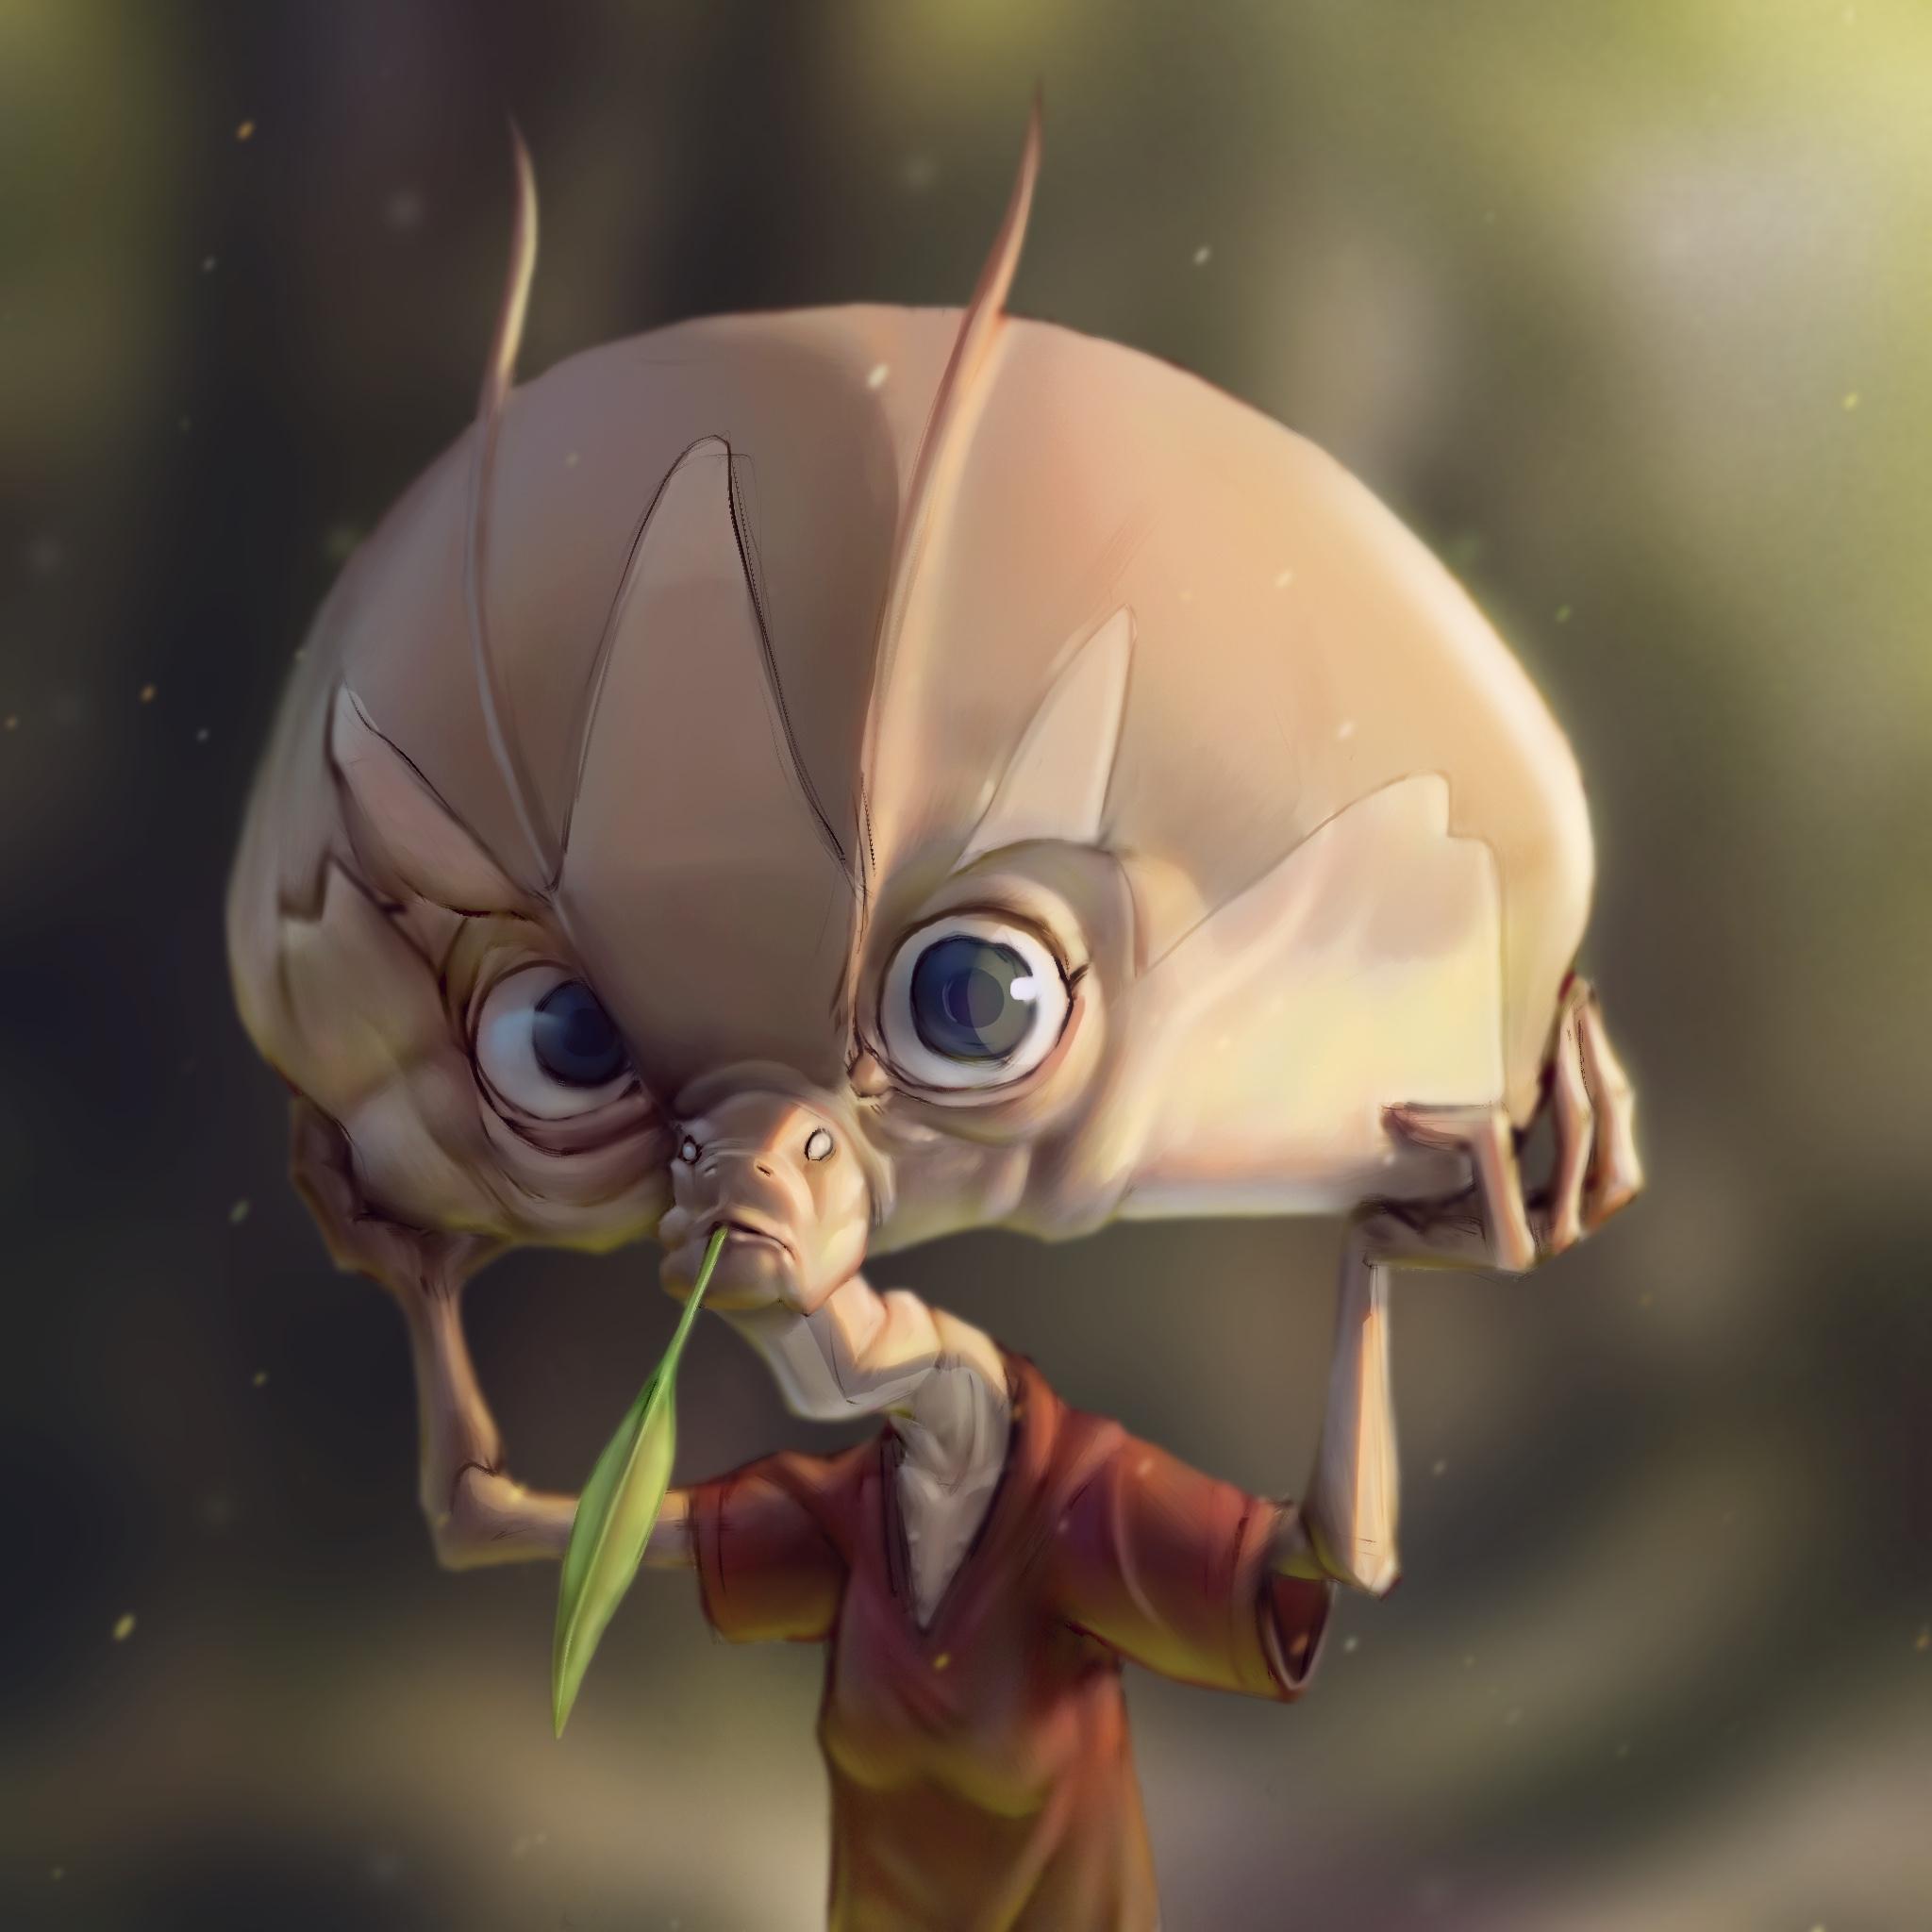 Grosse tête d'alien de l'overpaint de Borodante (Procreate)